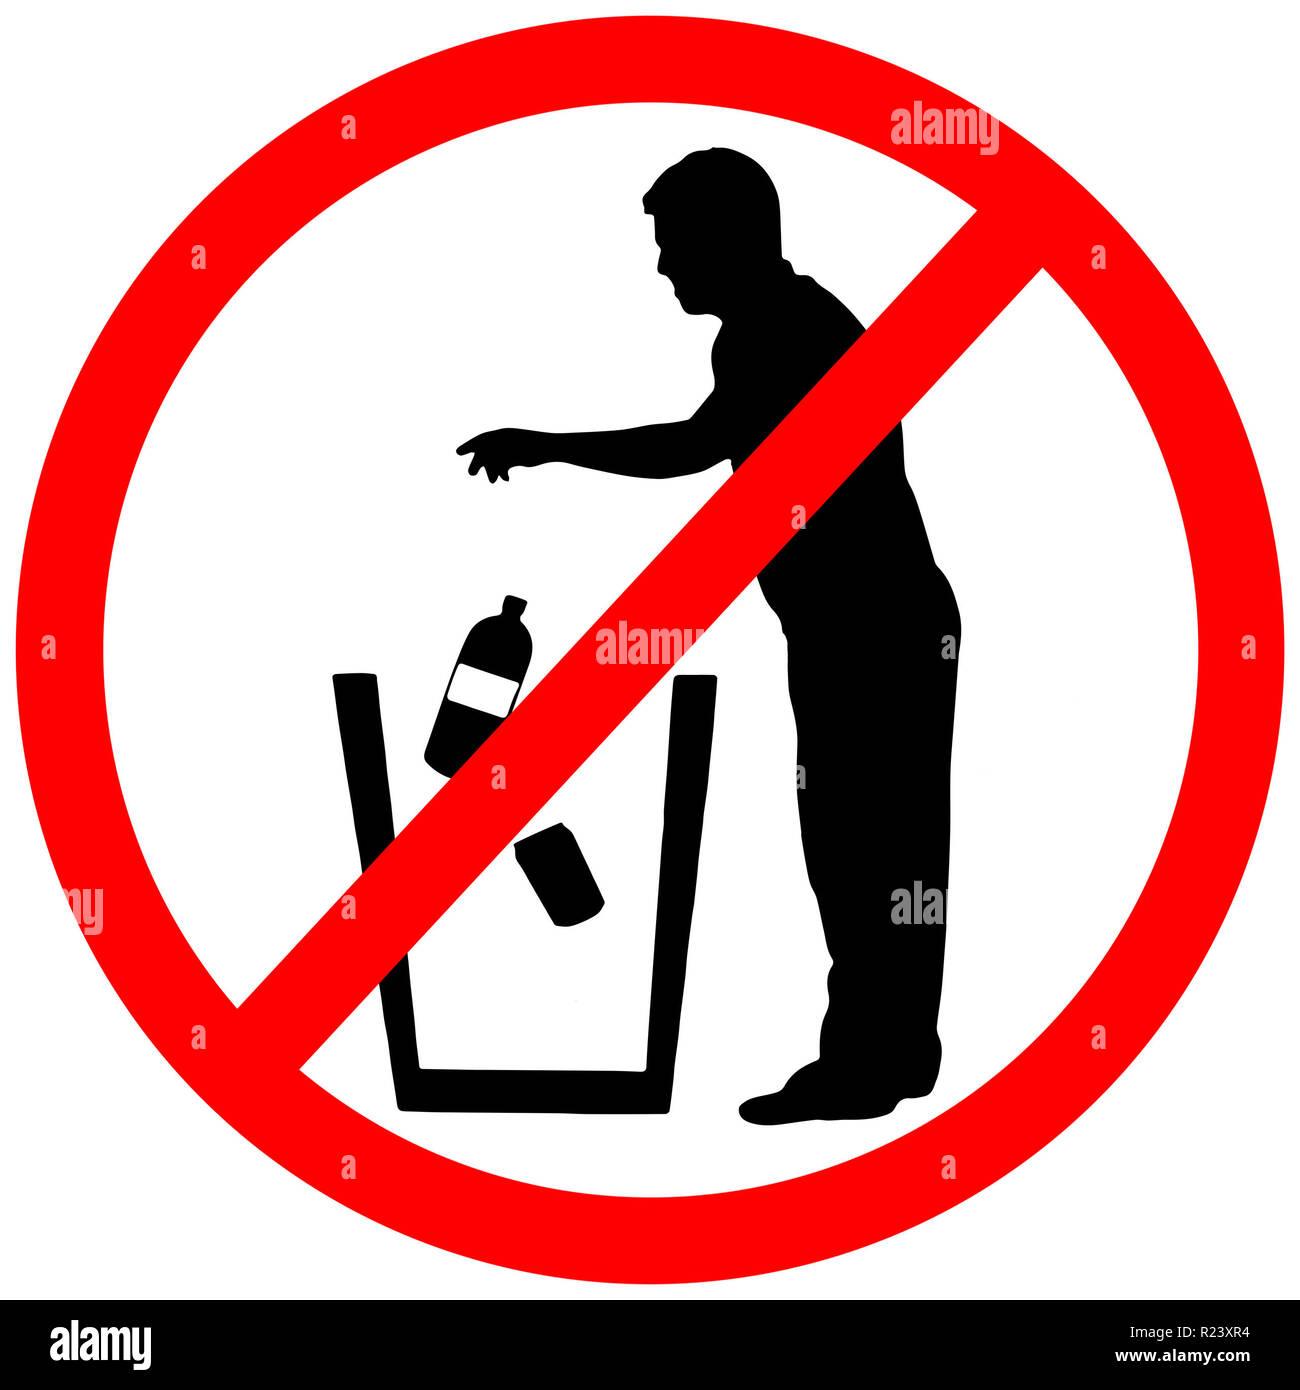 garbage prohibition photos garbage prohibition images. Black Bedroom Furniture Sets. Home Design Ideas